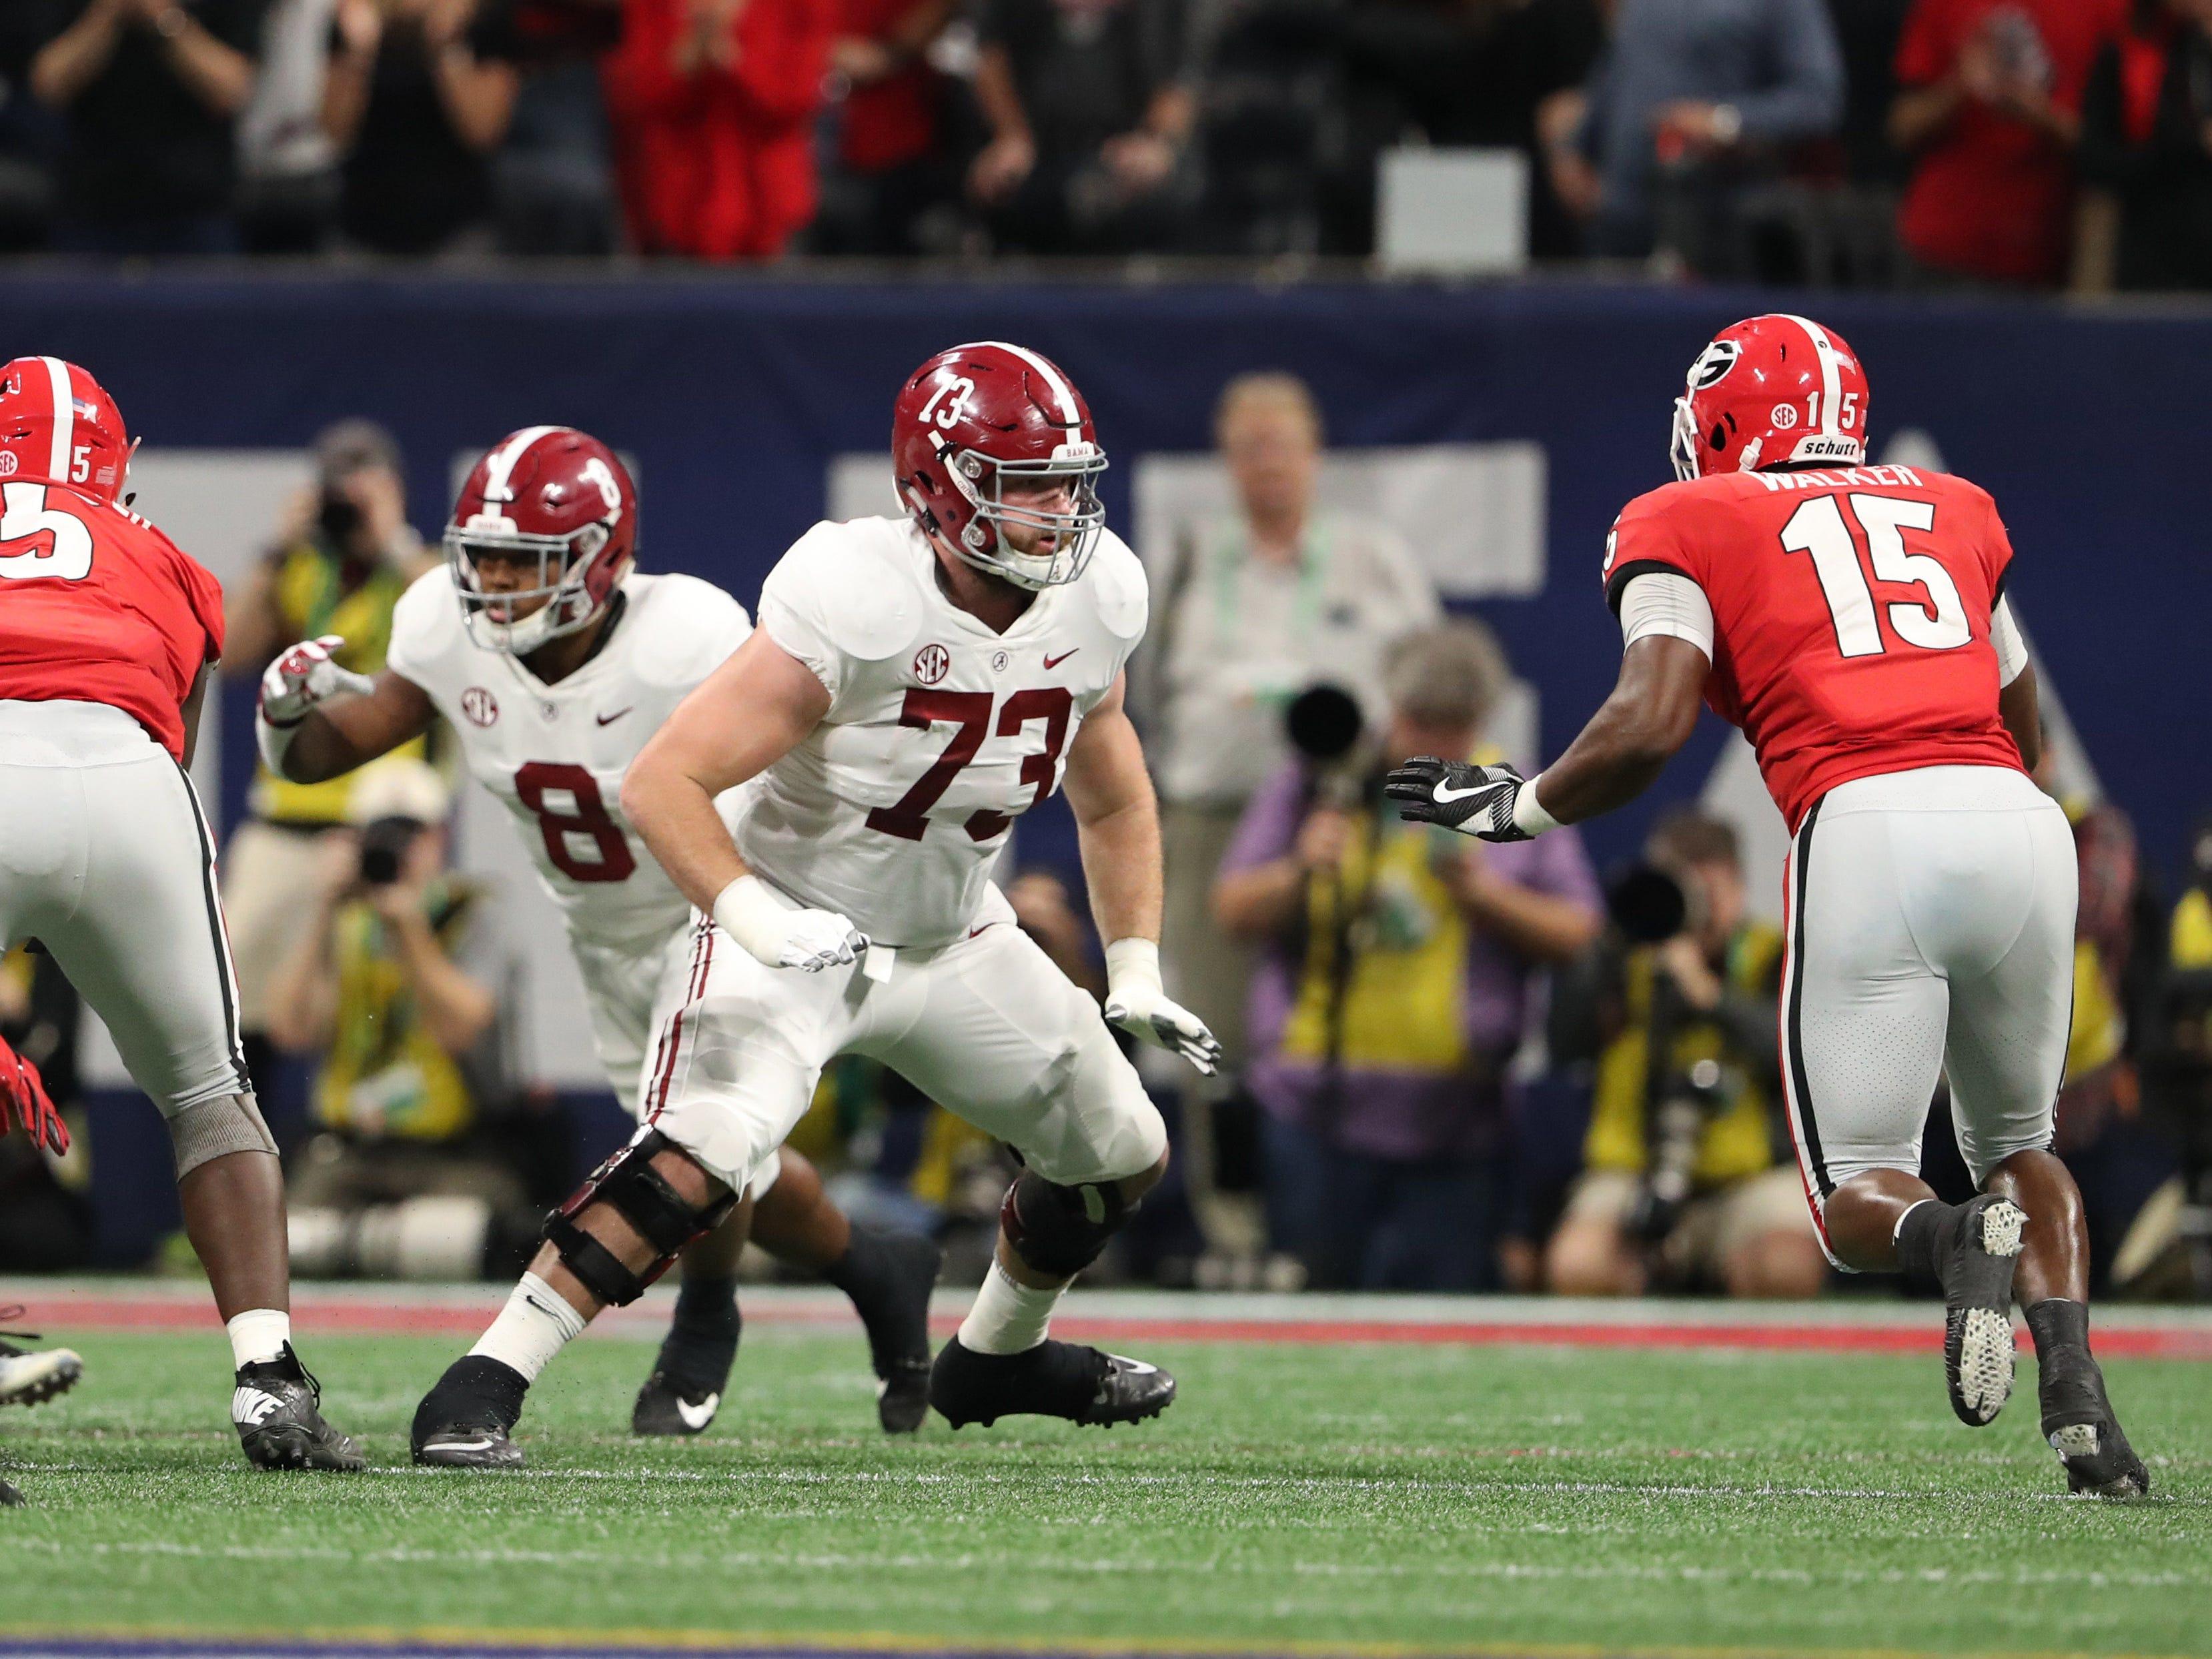 Alabama offensive lineman Jonah Williams blocks Georgia linebacker D'Andre Walker during the SEC championship game at Mercedes-Benz Stadium, Dec. 1, 2018.